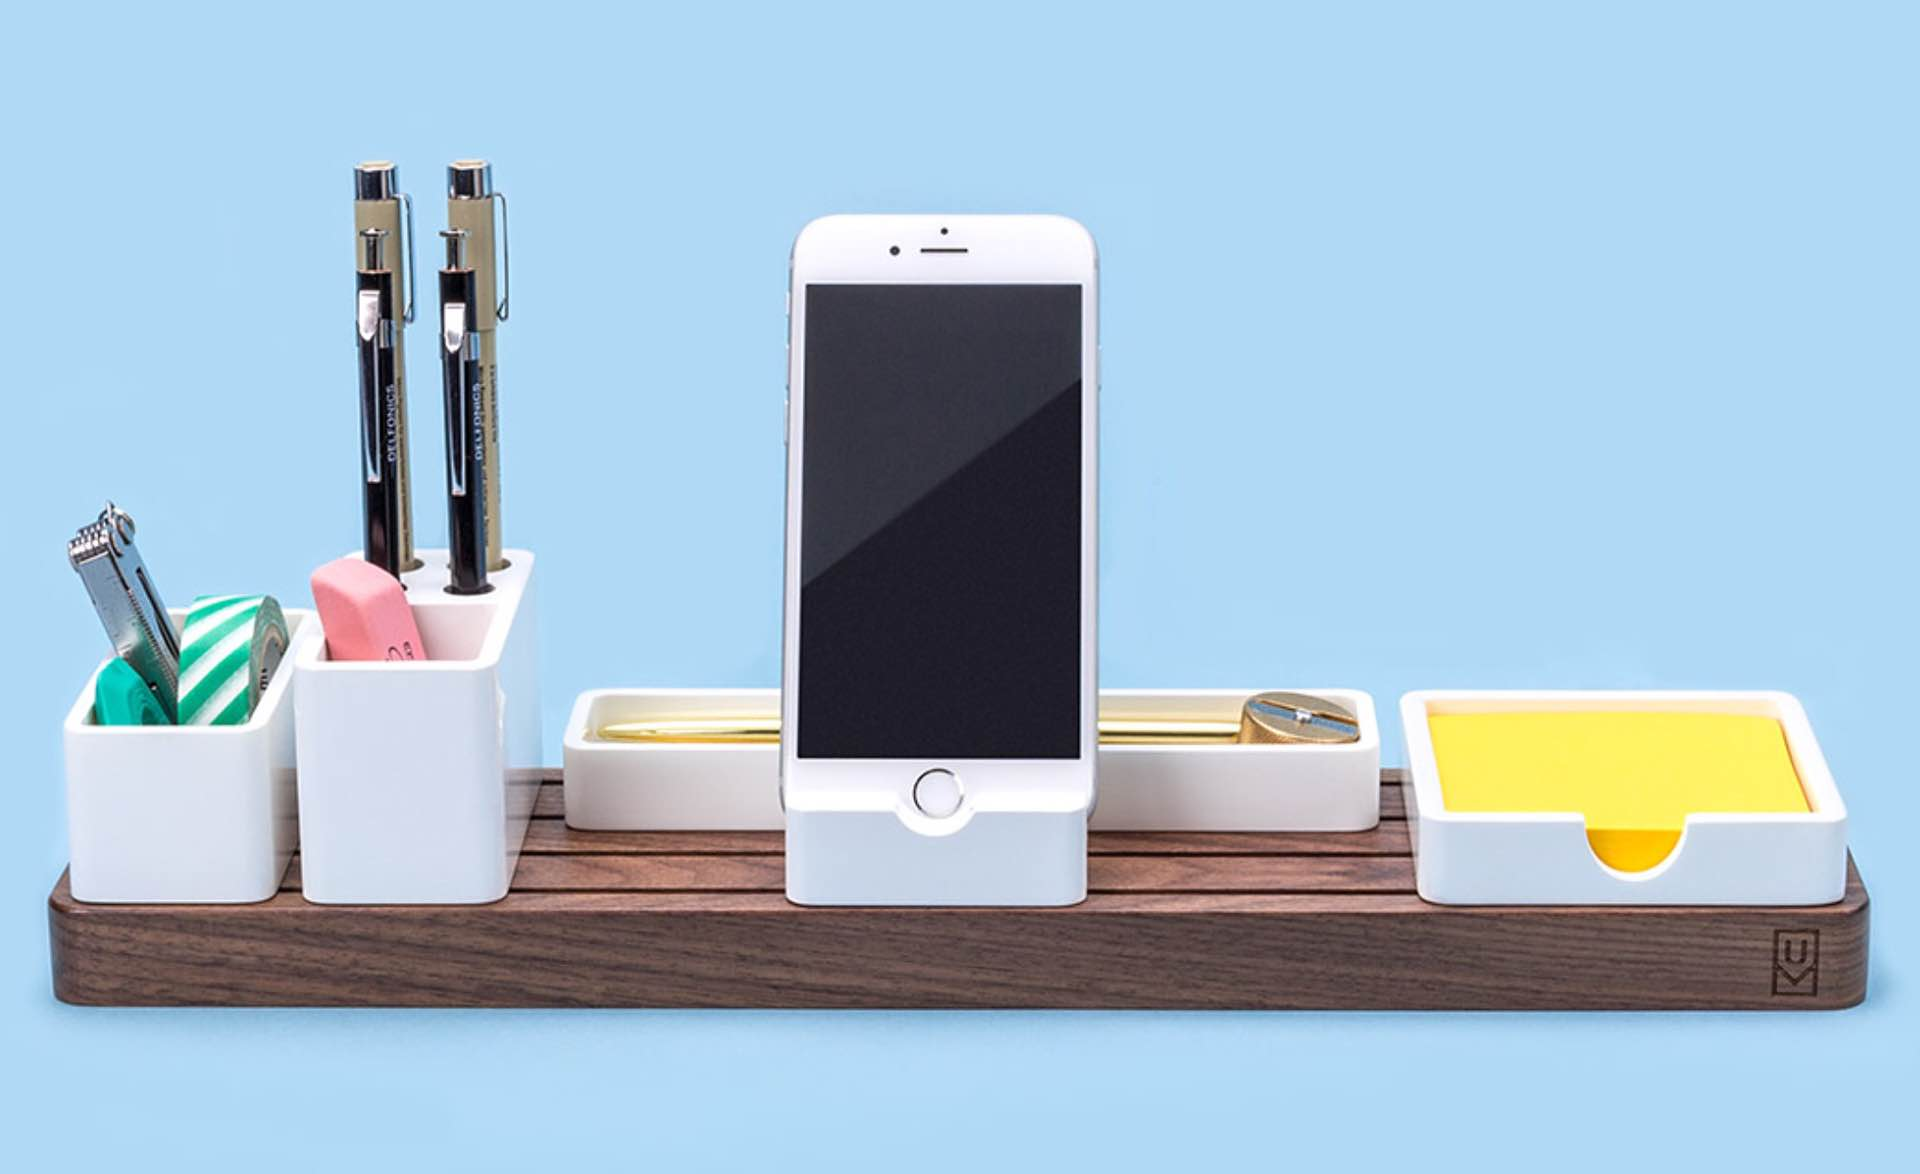 ugmonk-gather-desk-organizer-kickstarter-1